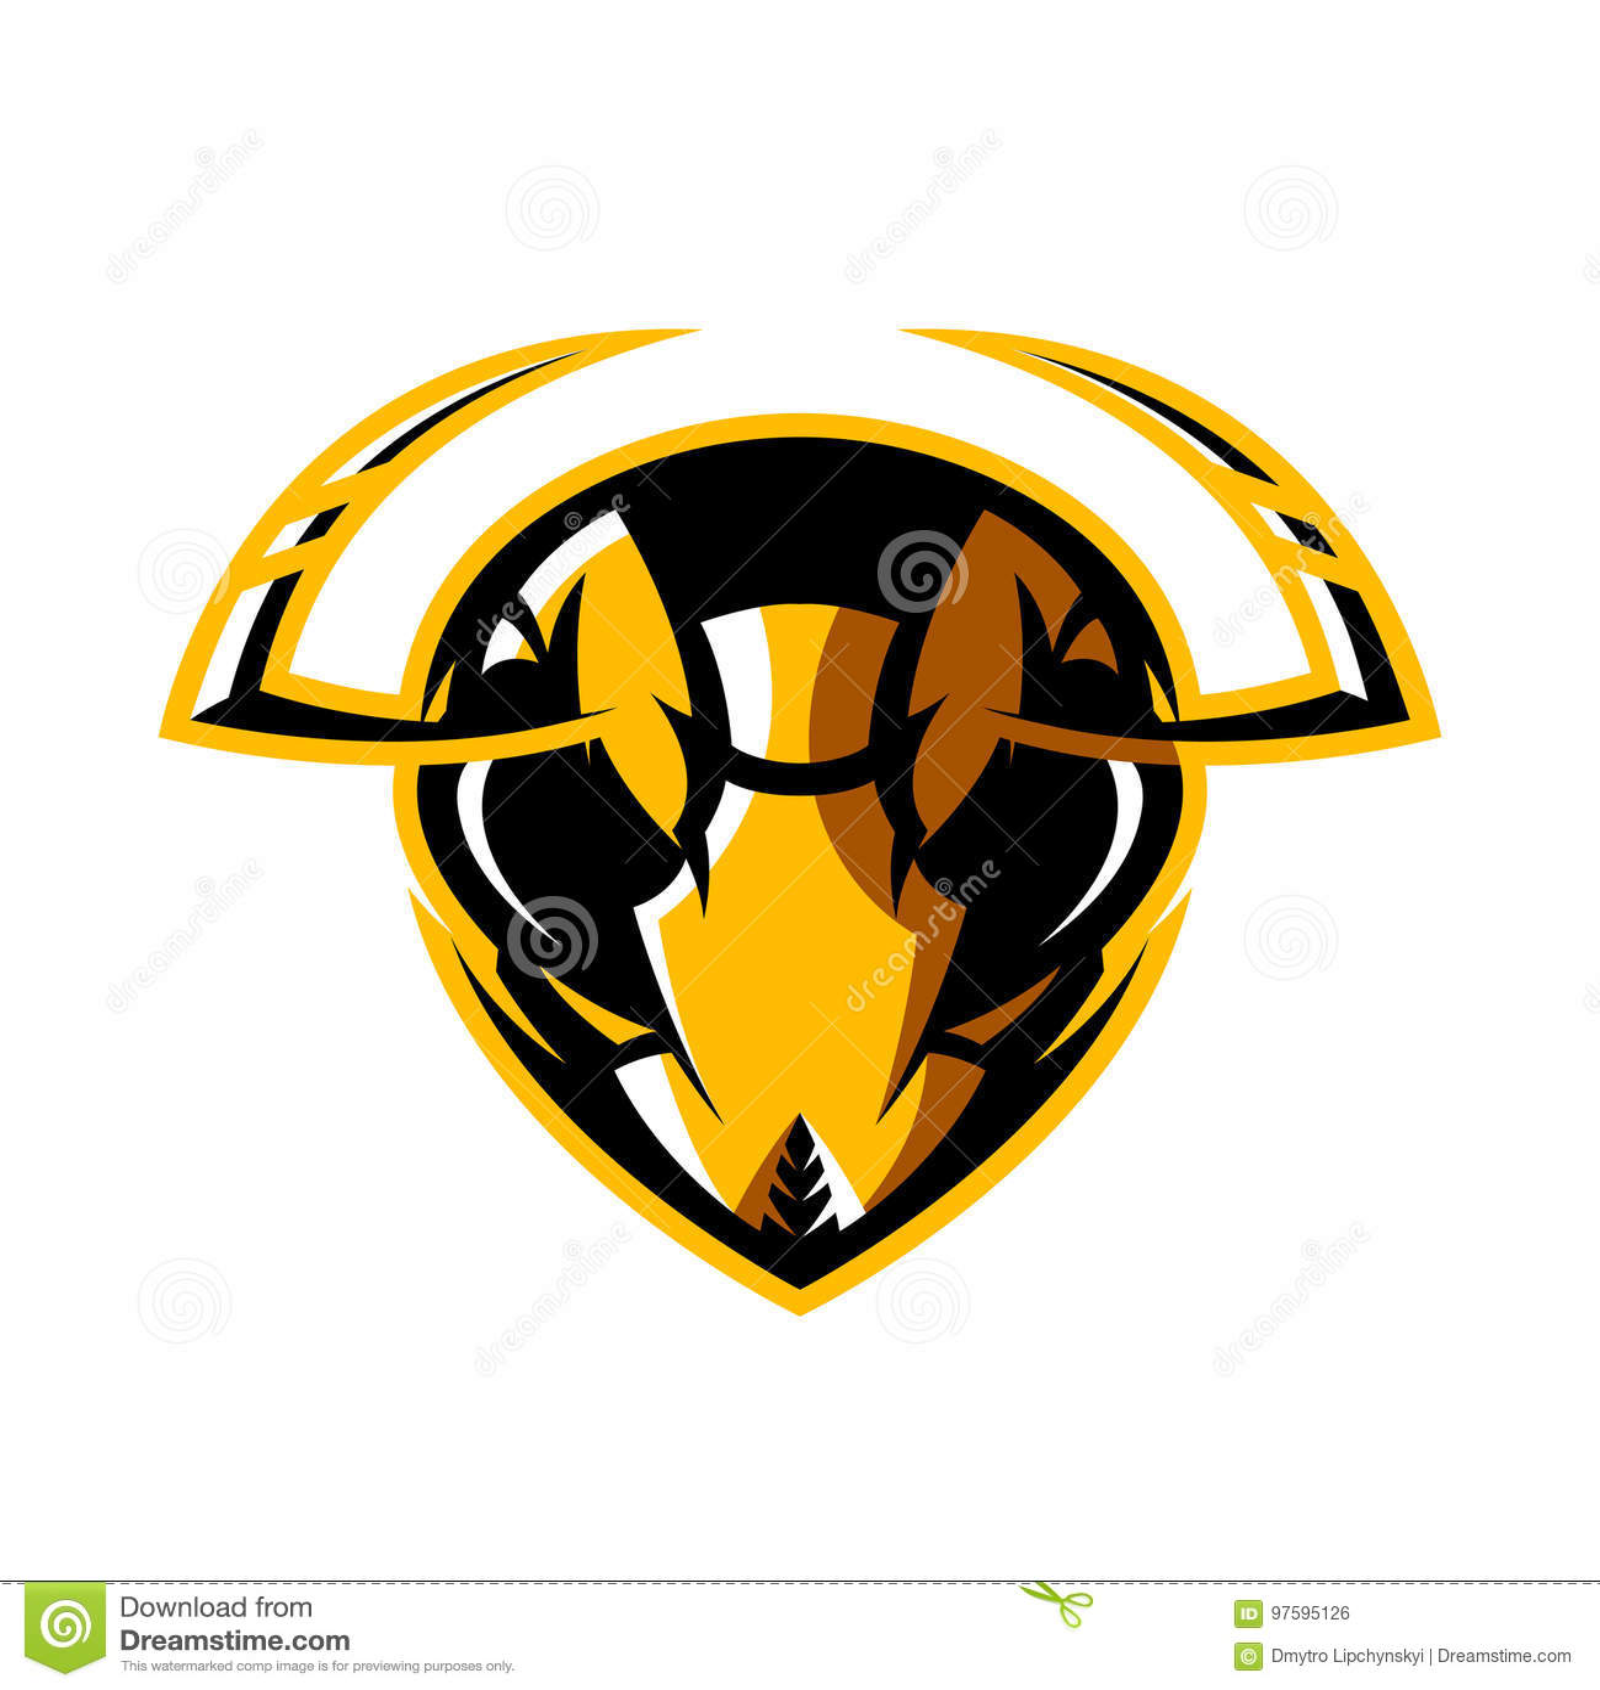 Furious Hornet Head Athletic Club Vector Logo Concept Isolated On